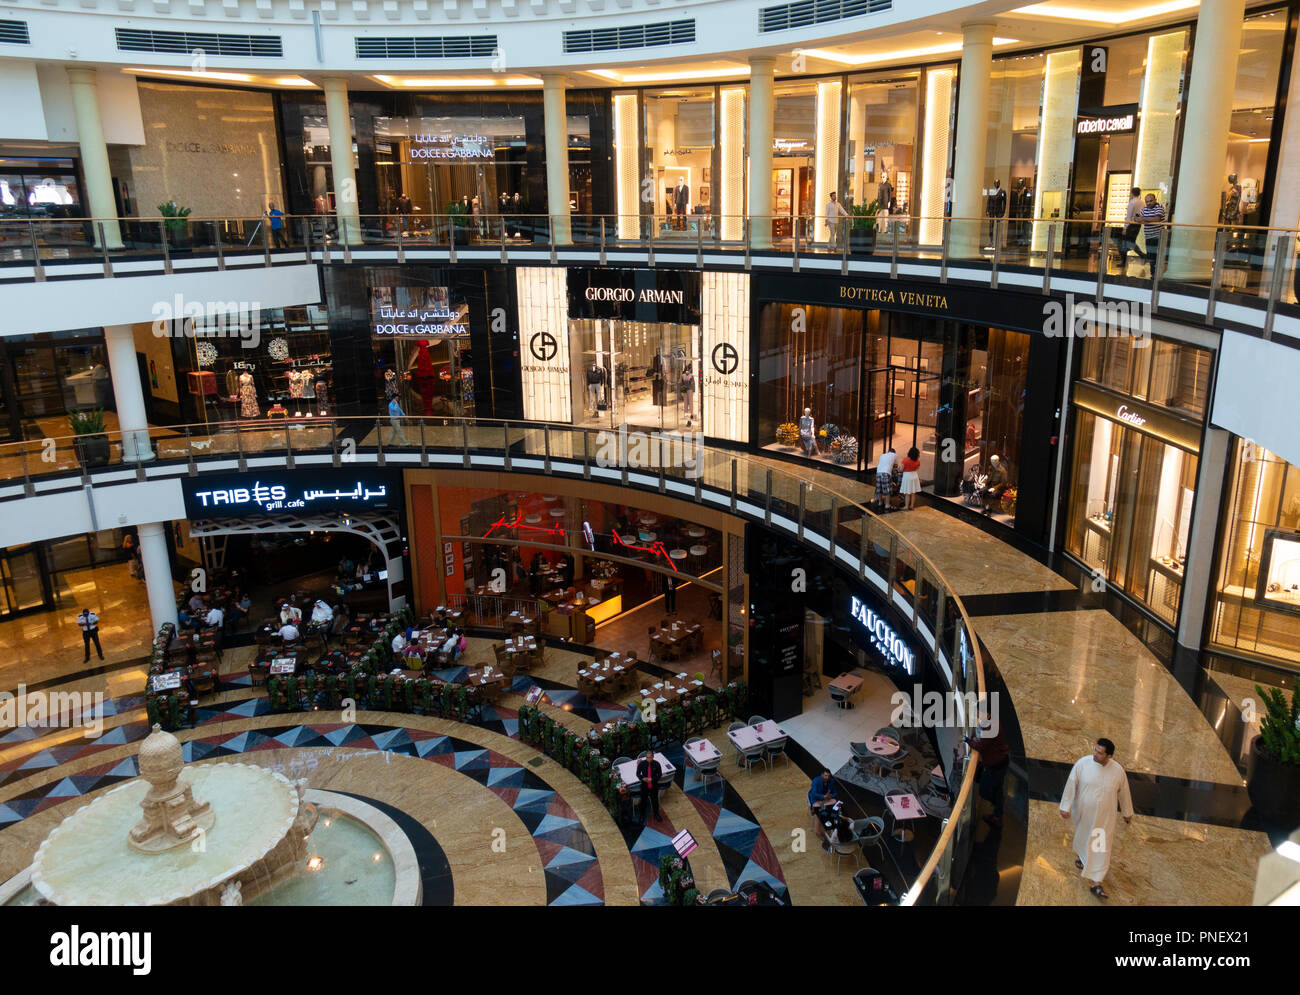 Interior of Mall of the Emirates in Dubai, UAE - Stock Image